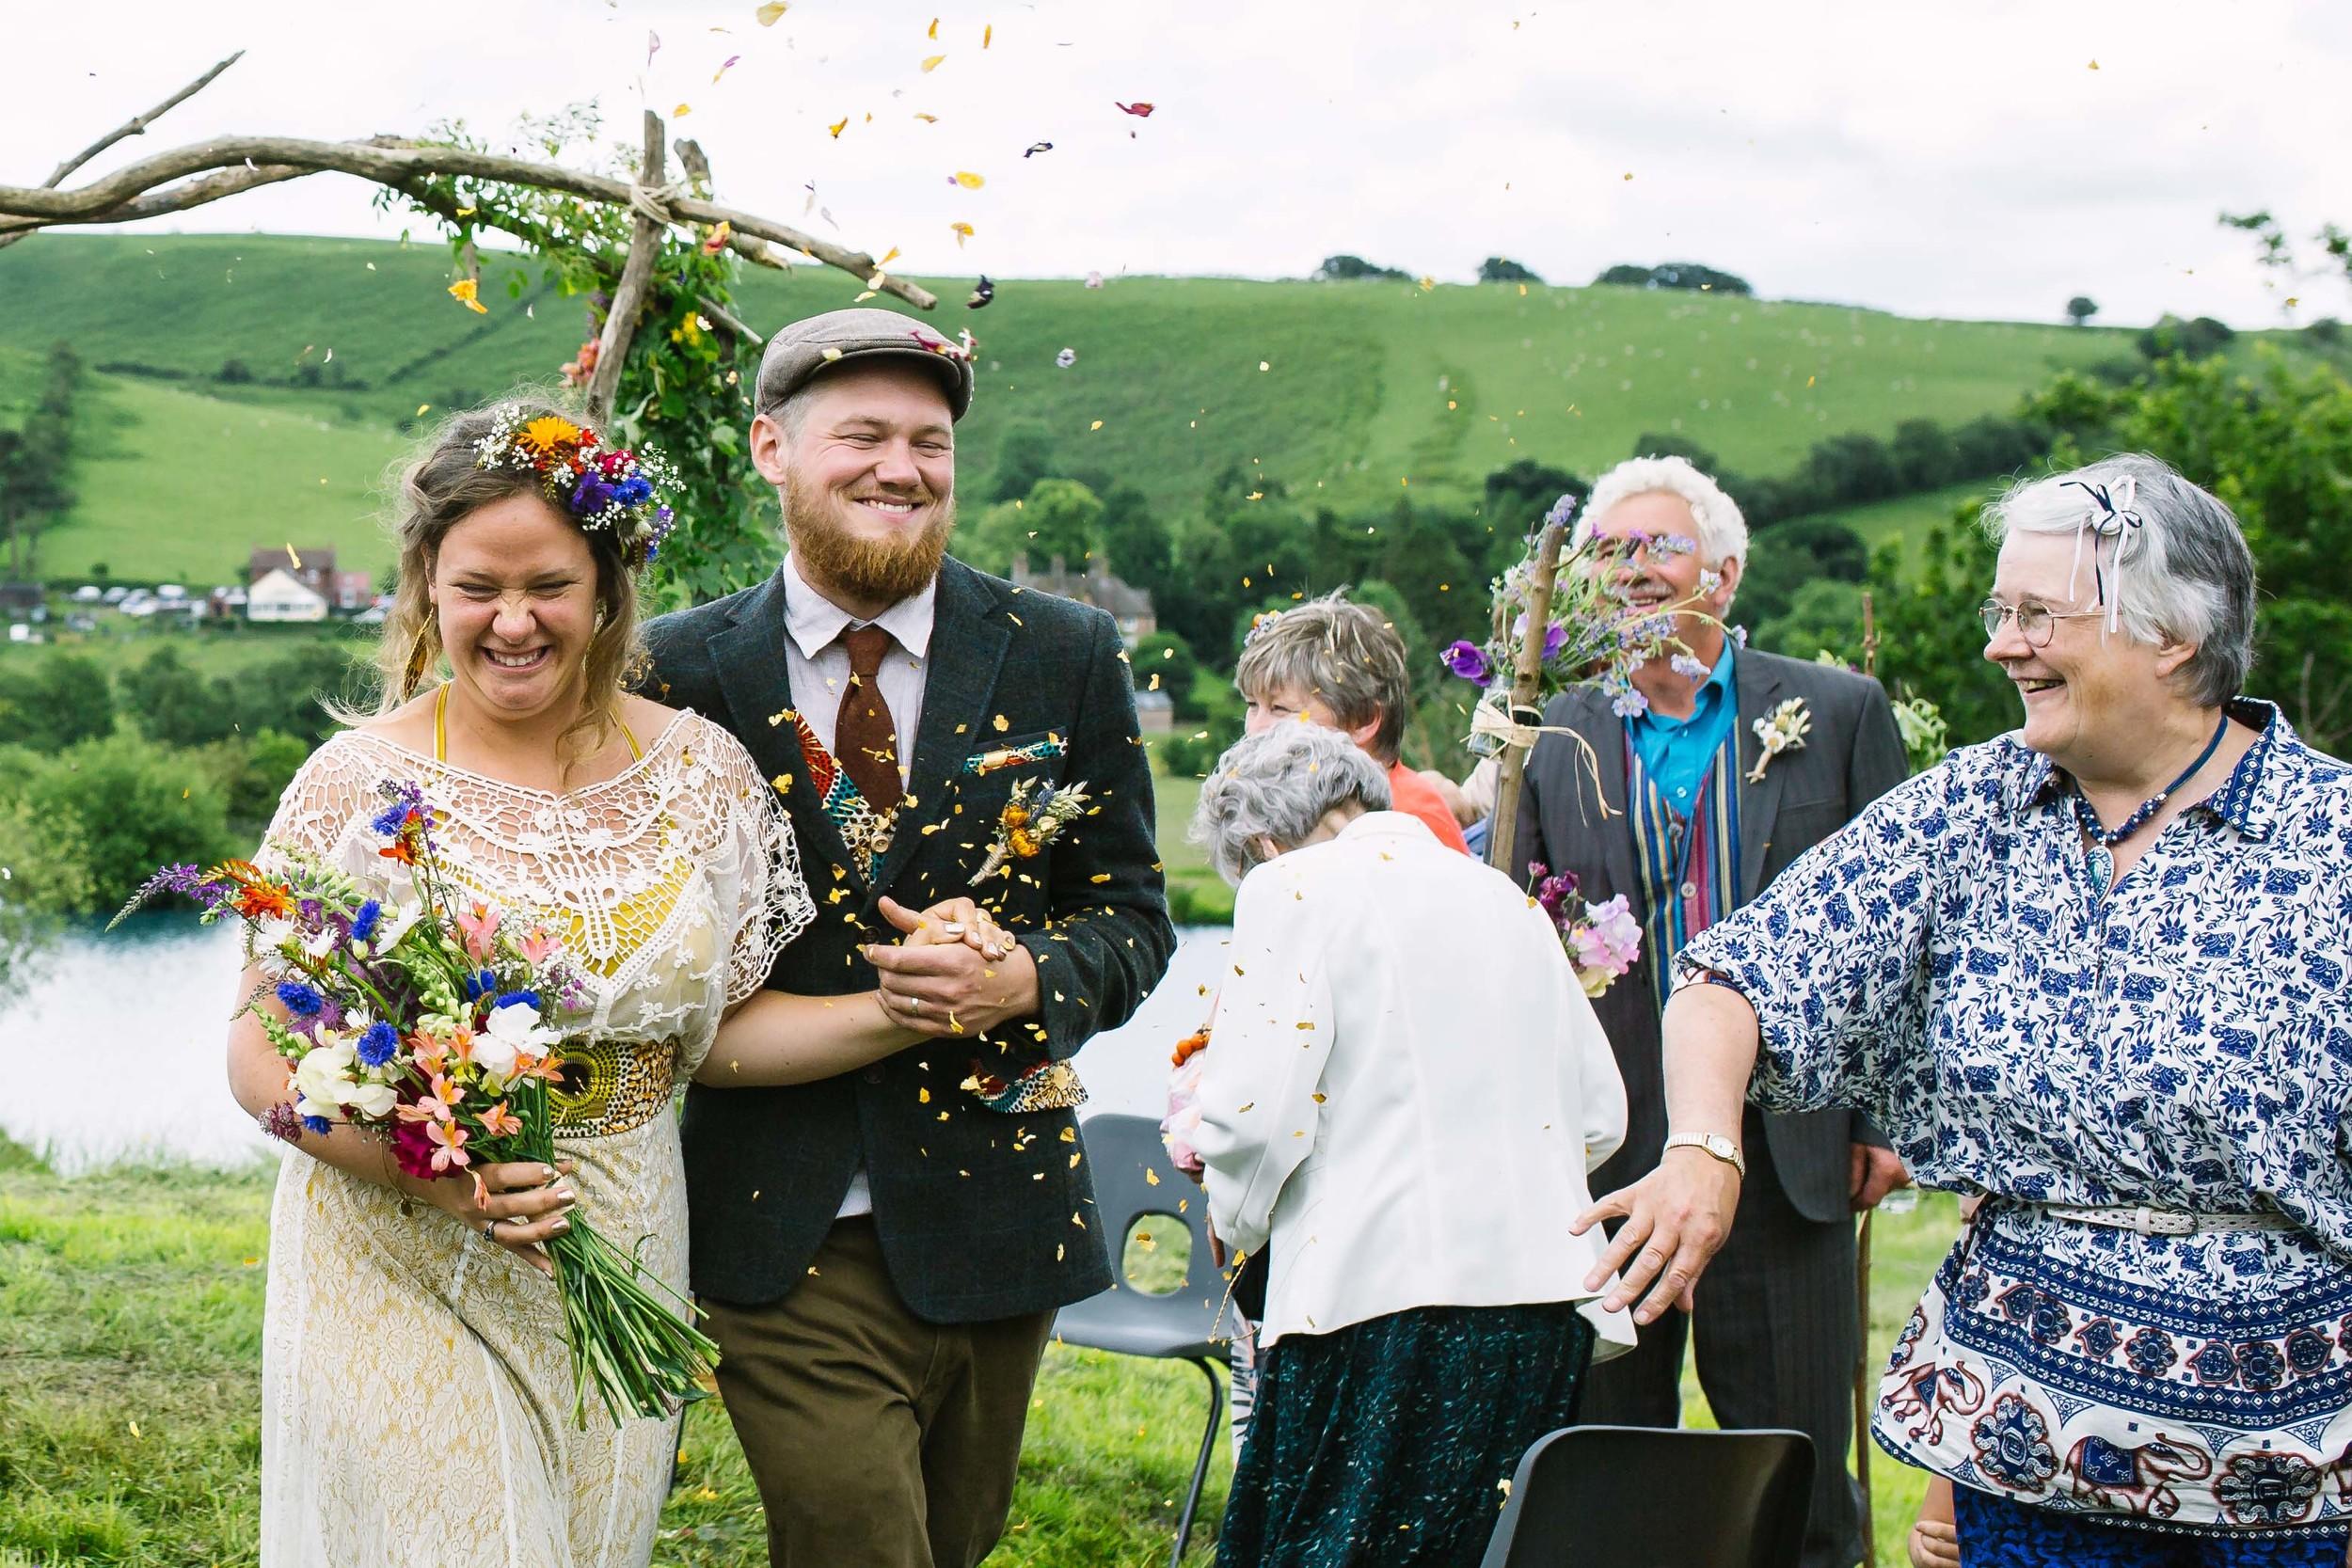 Festival-wedding-photographer-shropshire-olivia-moon-photography.jpg